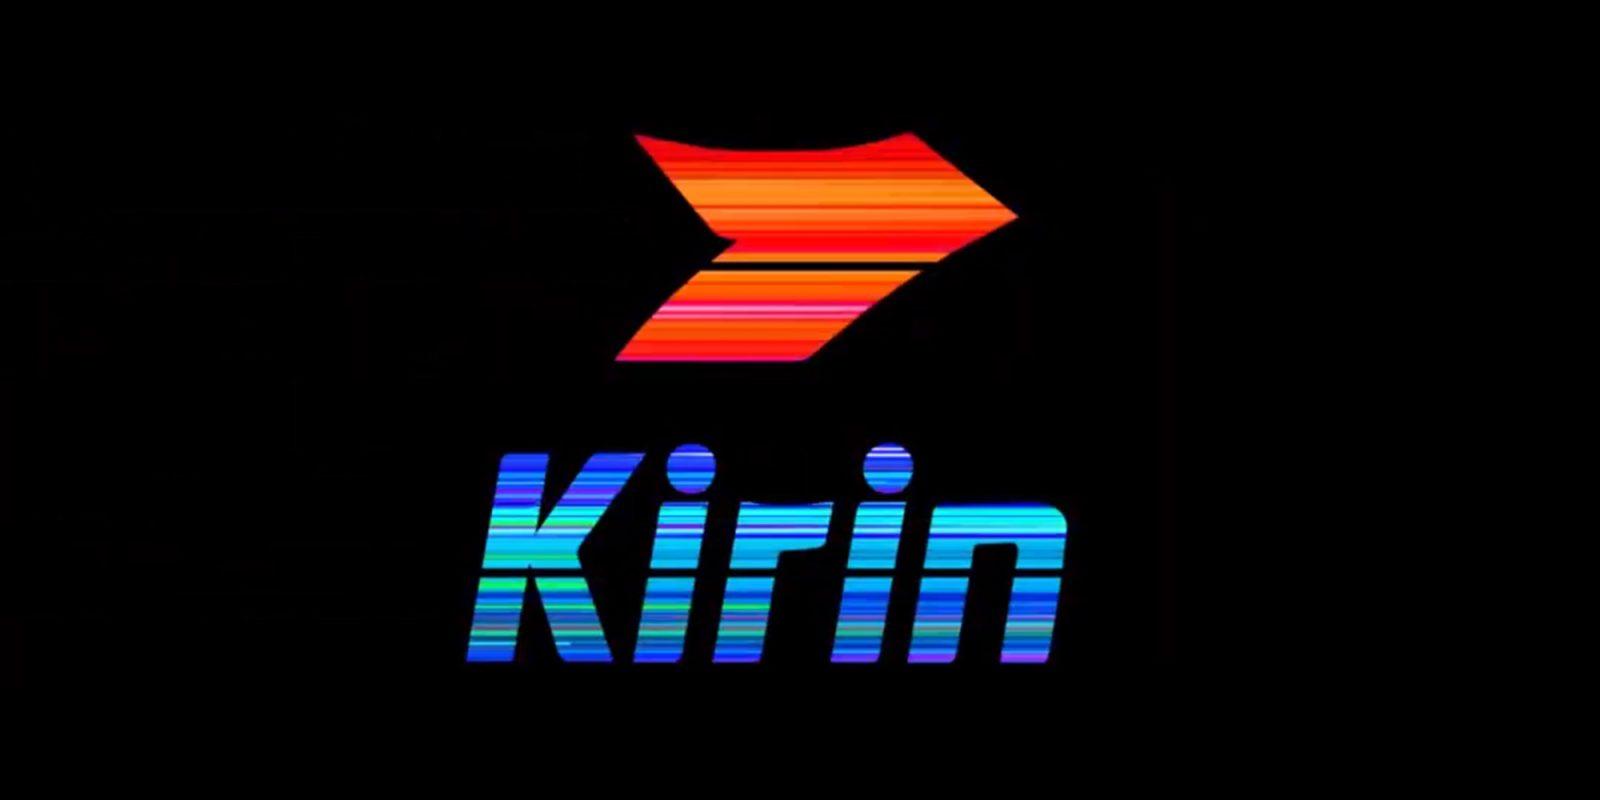 Huawei teaser confirms Kirin 990 launch date w/ potential 5G support